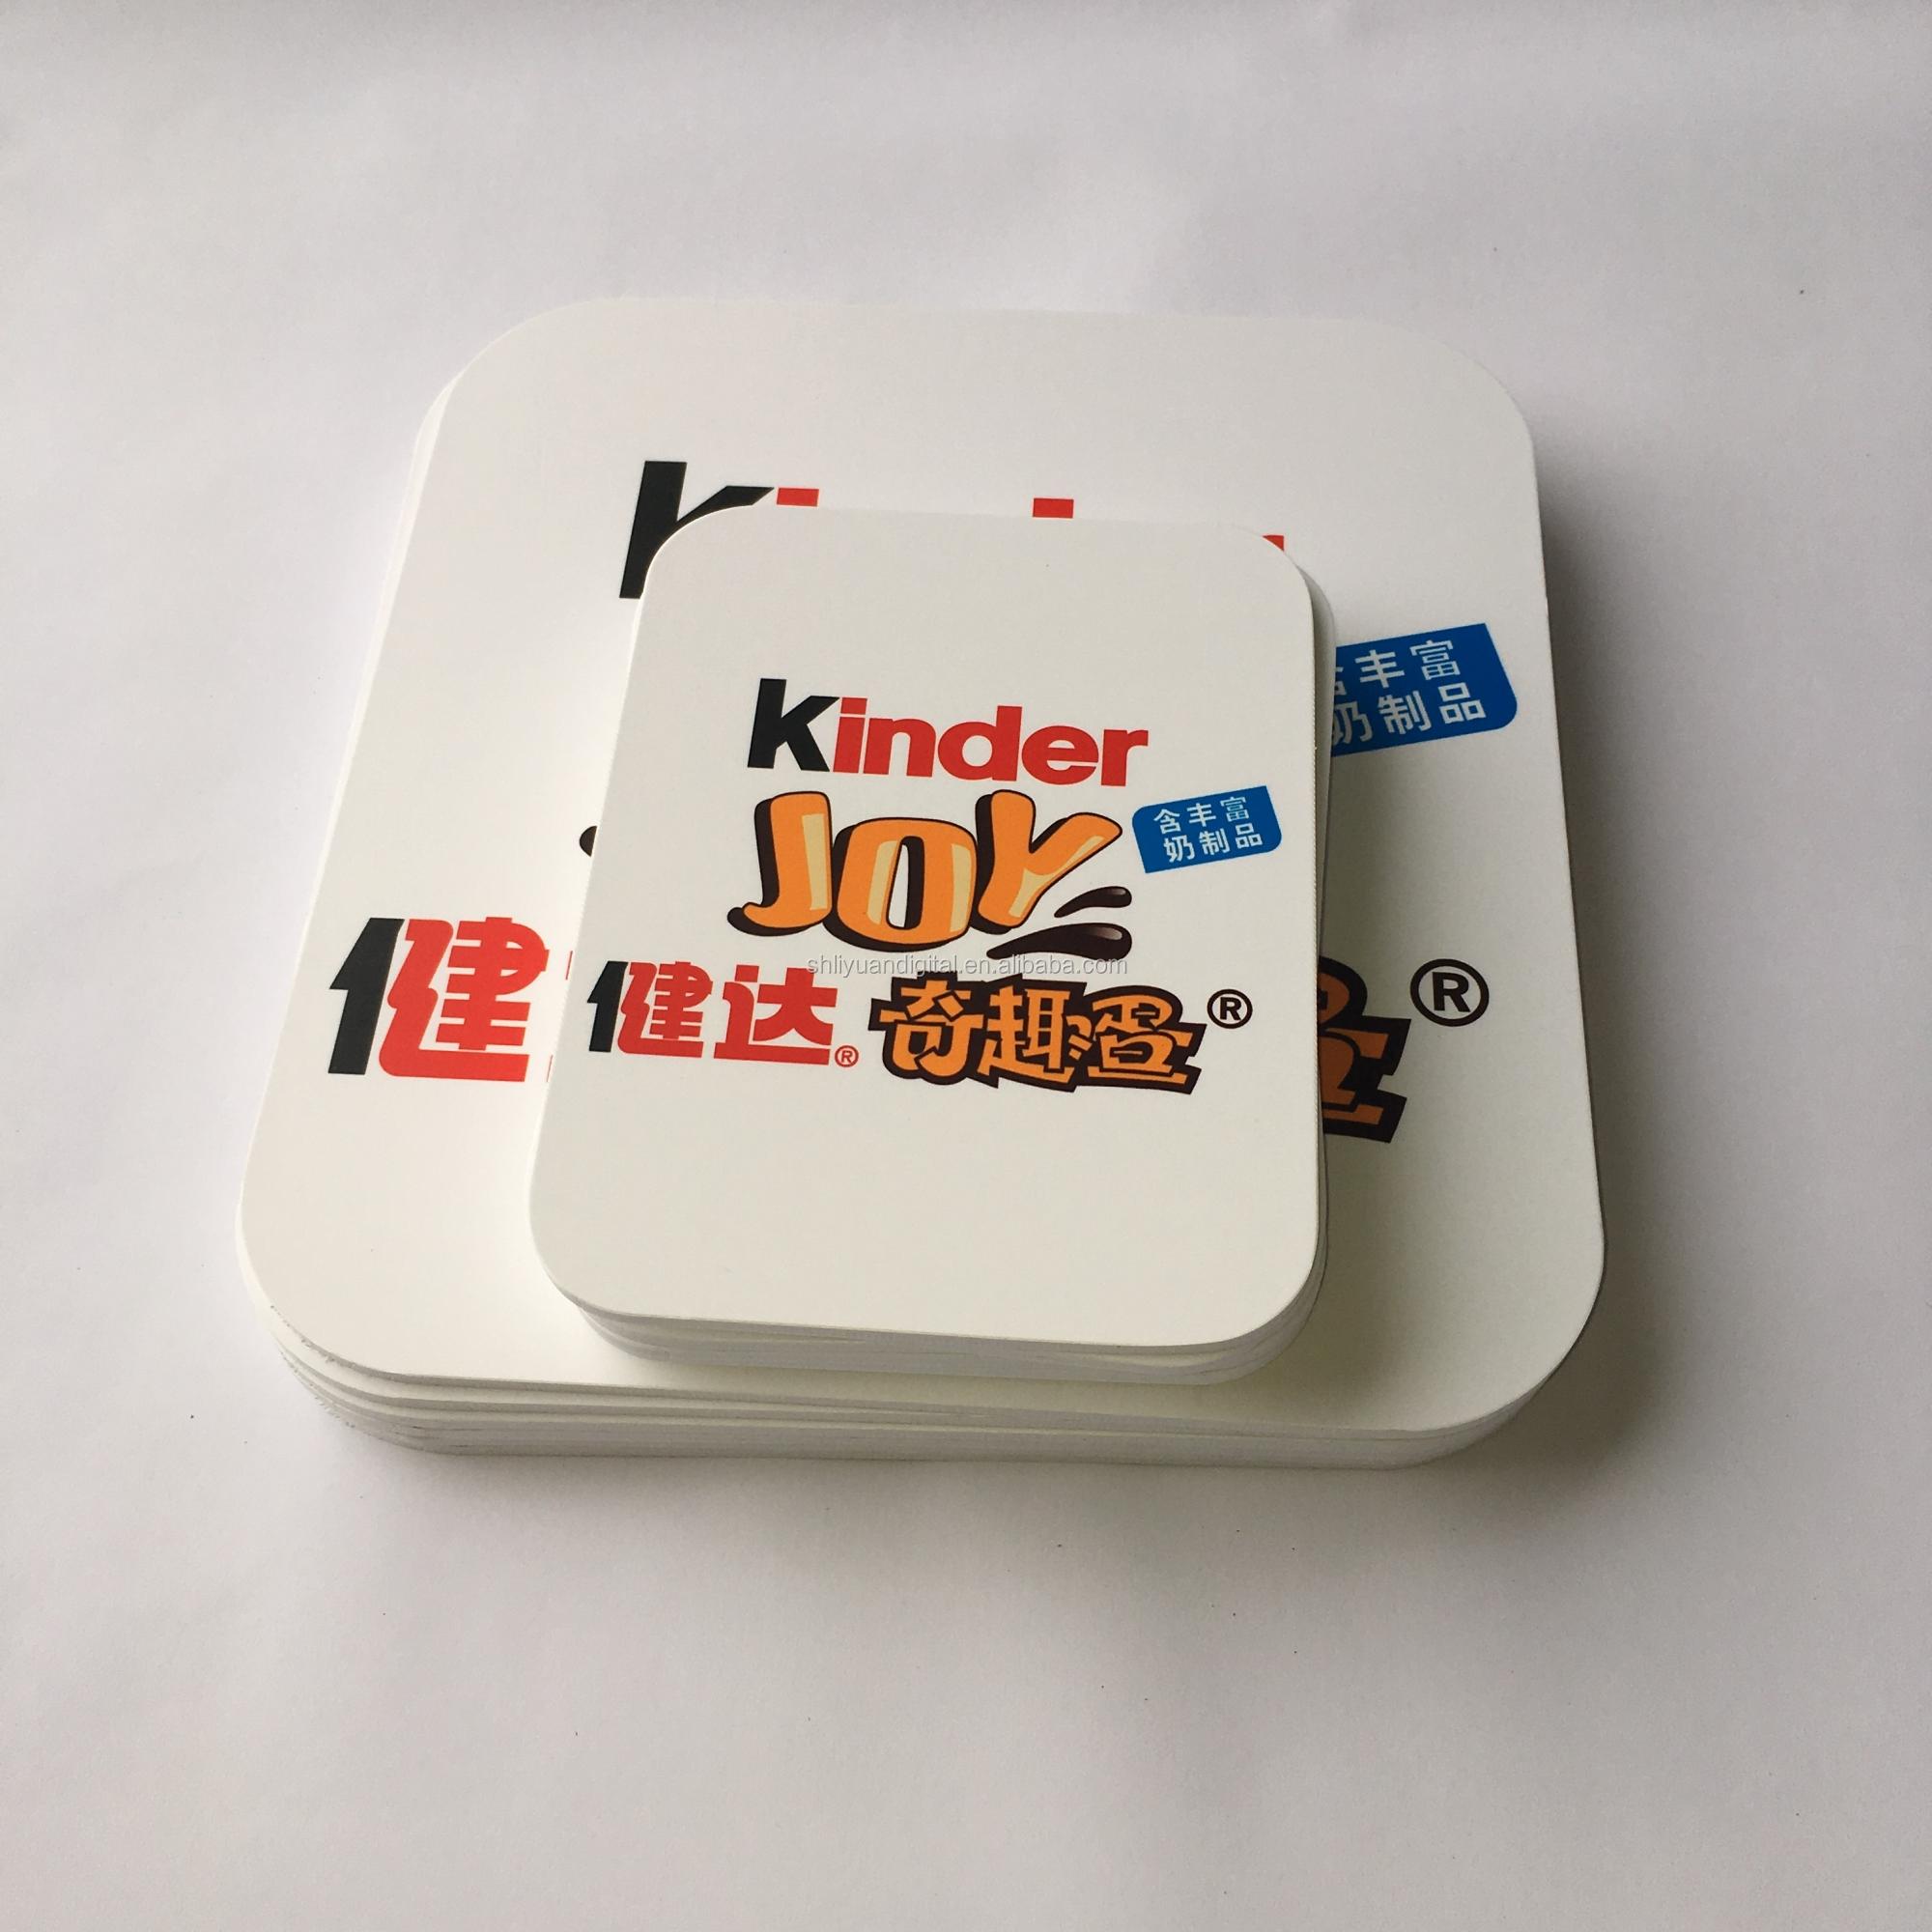 Rigid Stand Pvc Foam Board Wholesale Suppliers Alibaba Circuit Boardflexible Boardlow Cost Flexible Product